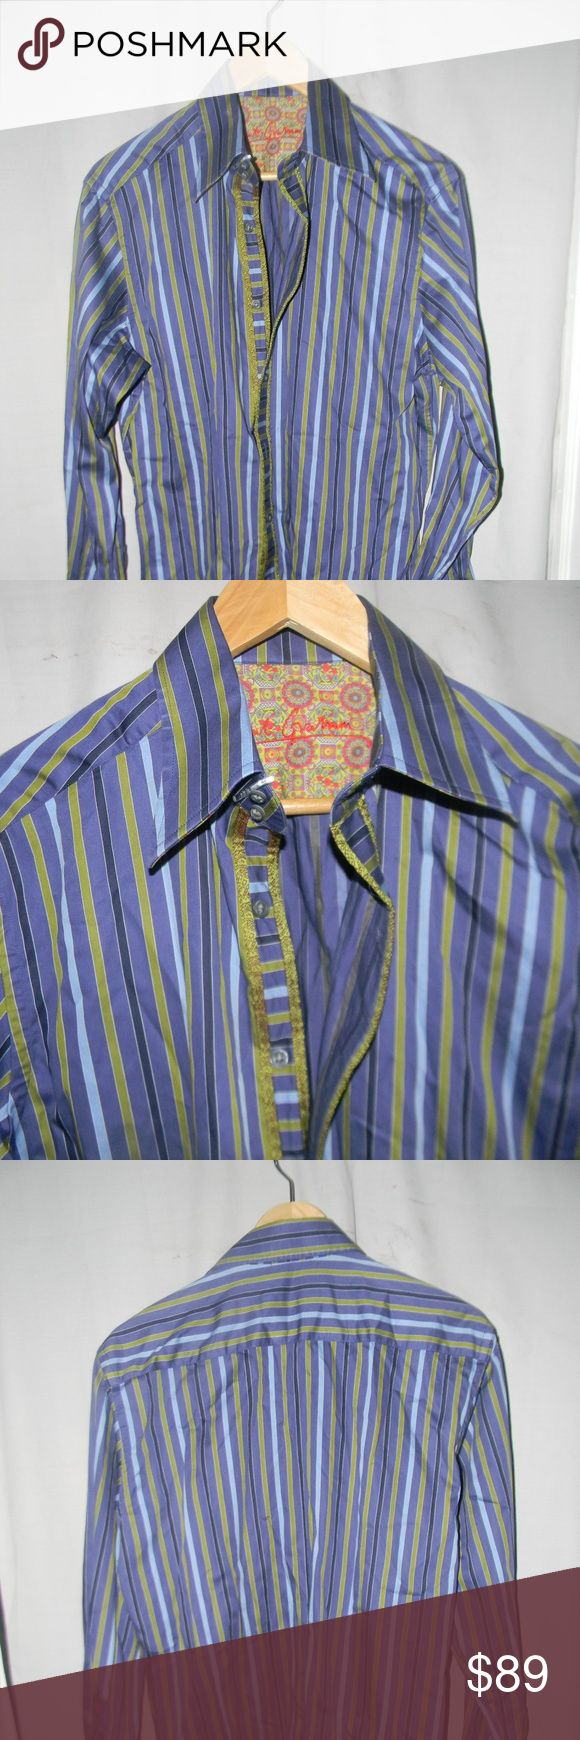 New Robert Graham Button Down Shirt New without tags a cotton purple green striped button down shirt Robert Graham Shirts